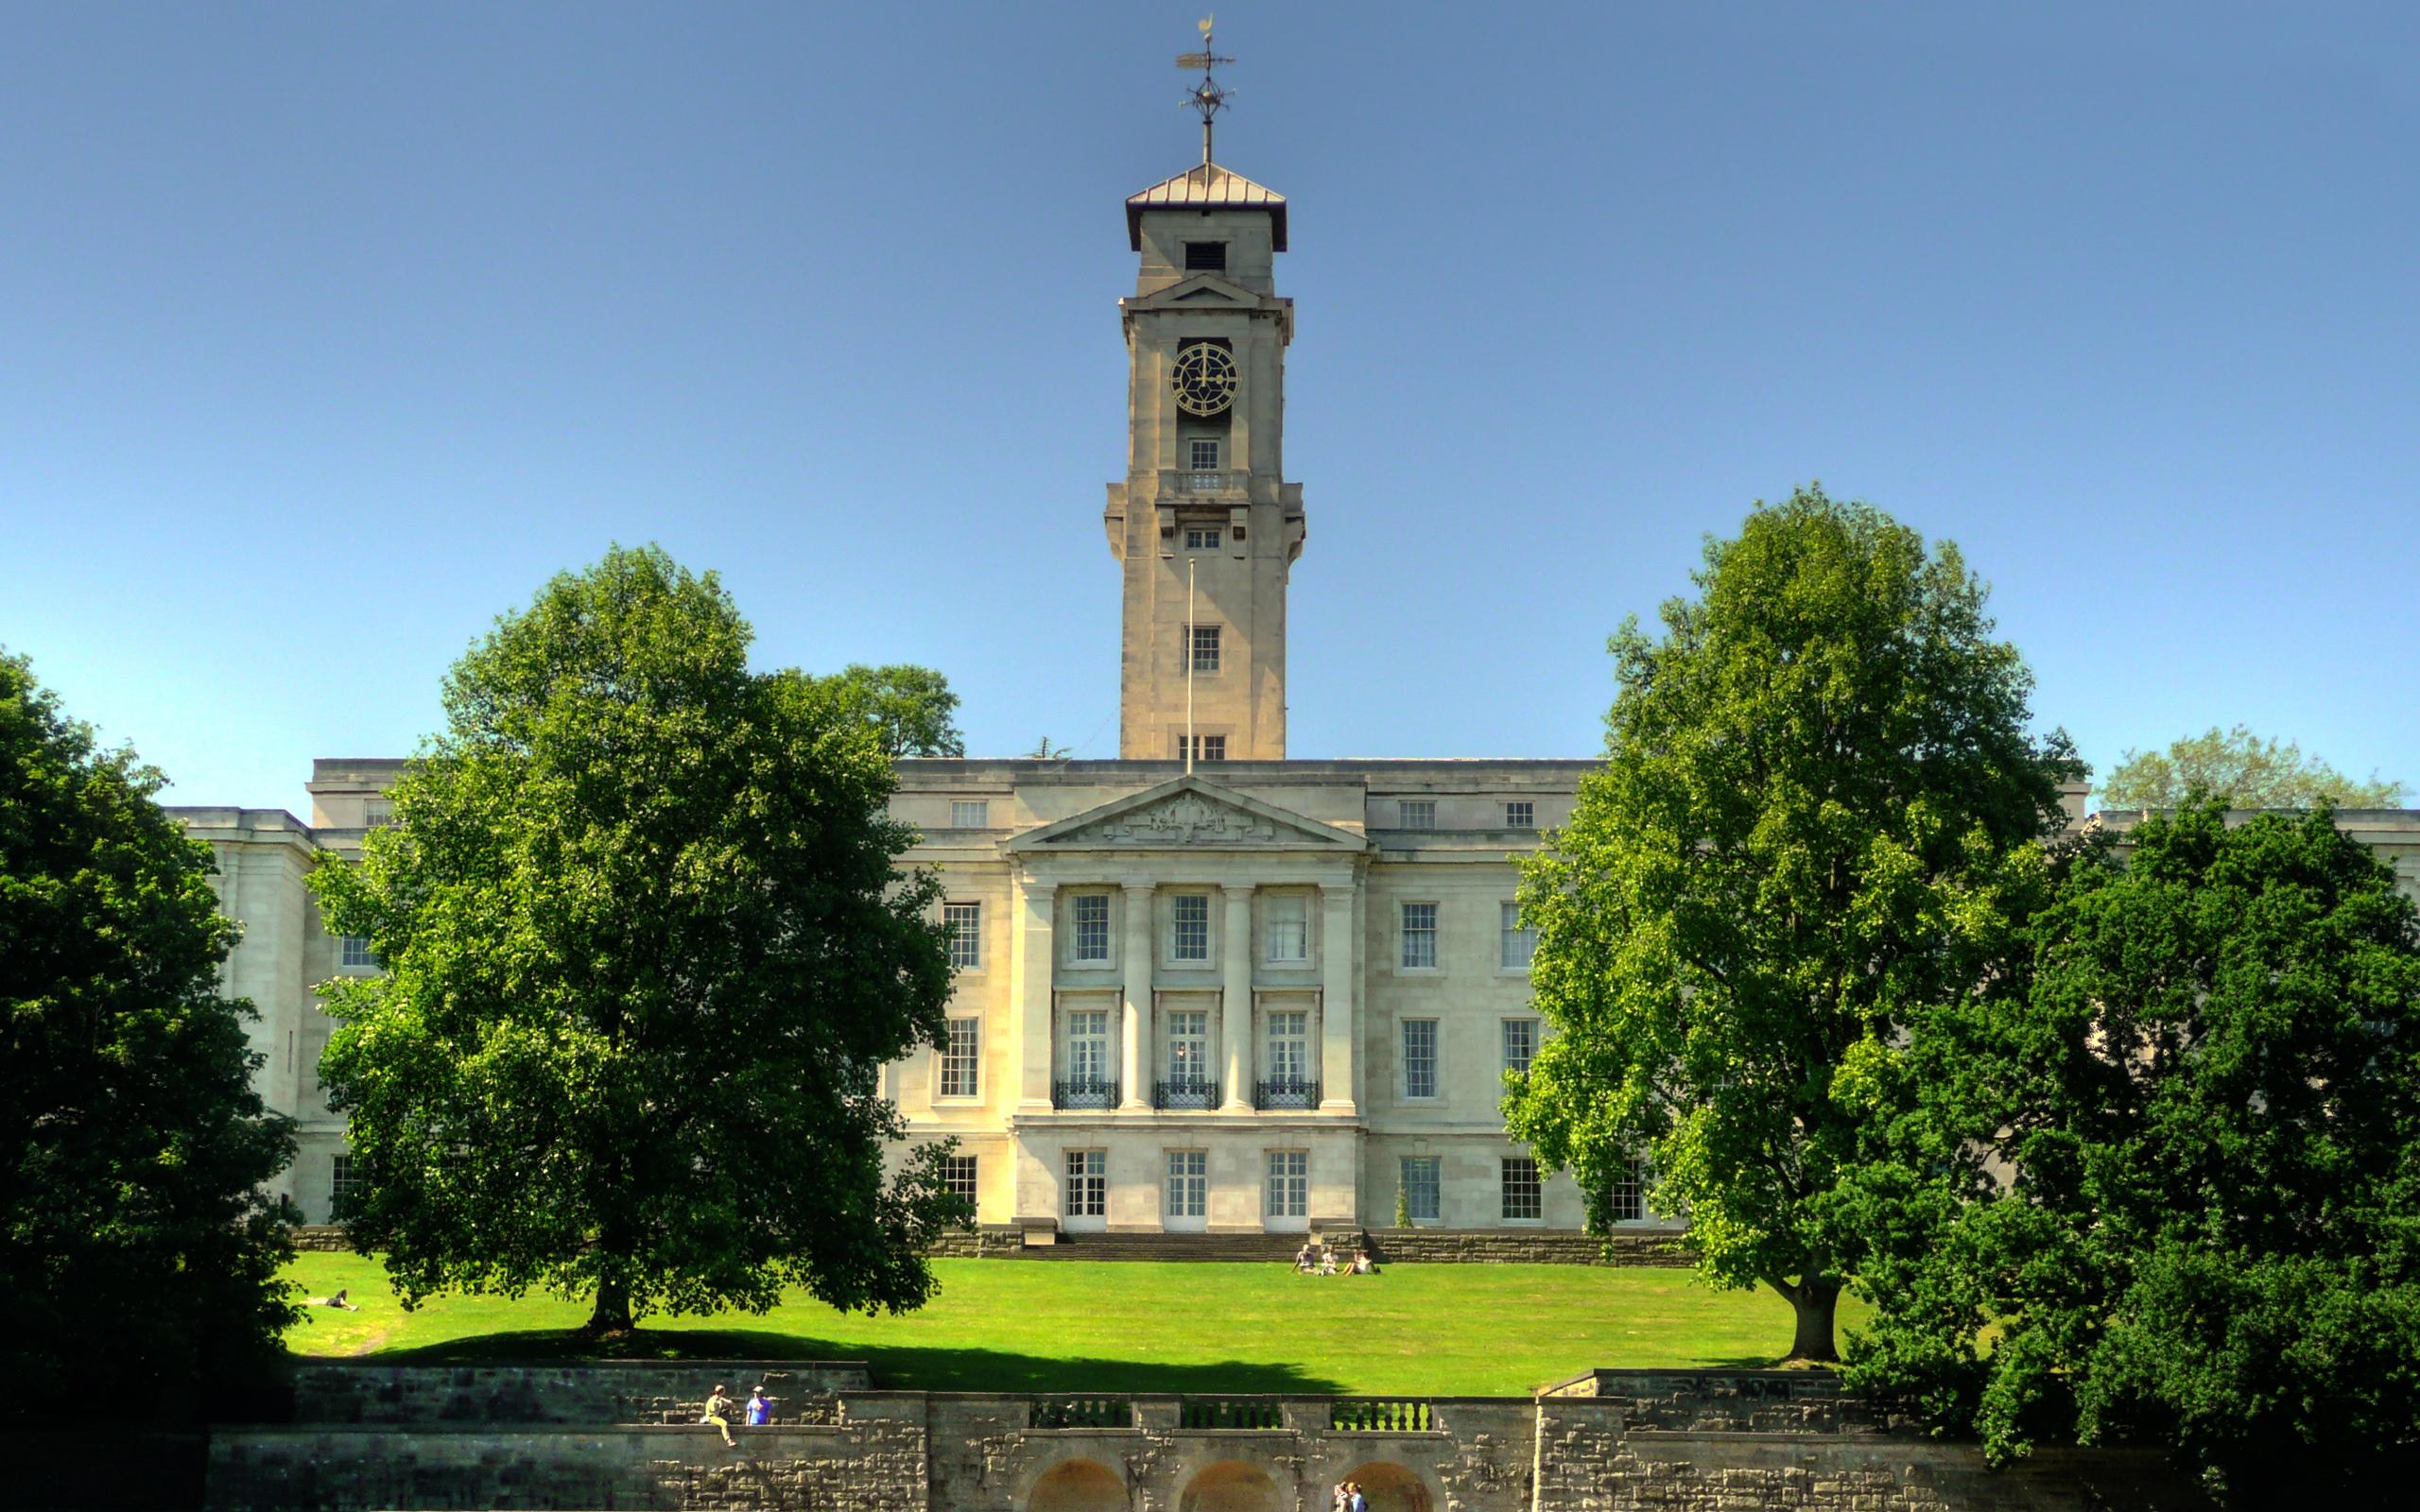 University of Nottingham and NTEC